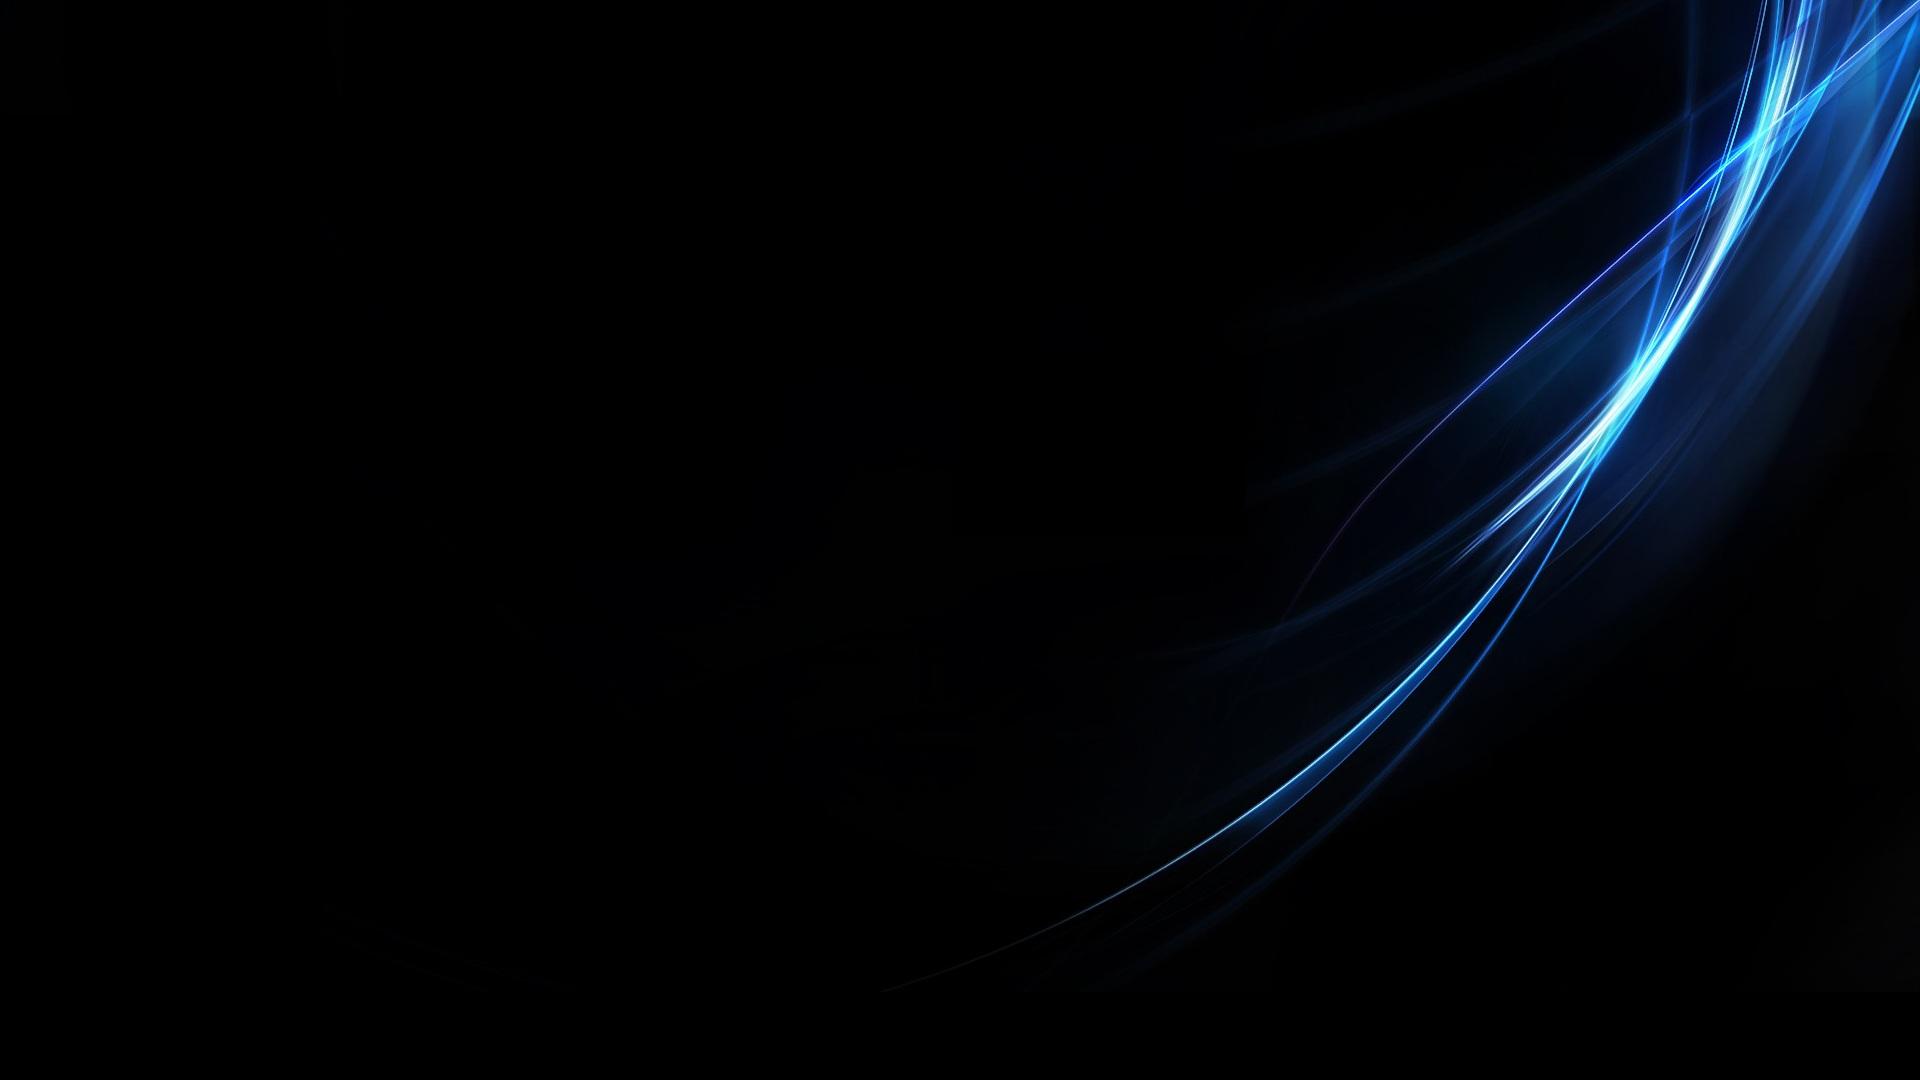 download 1920x1080 blue black -#main